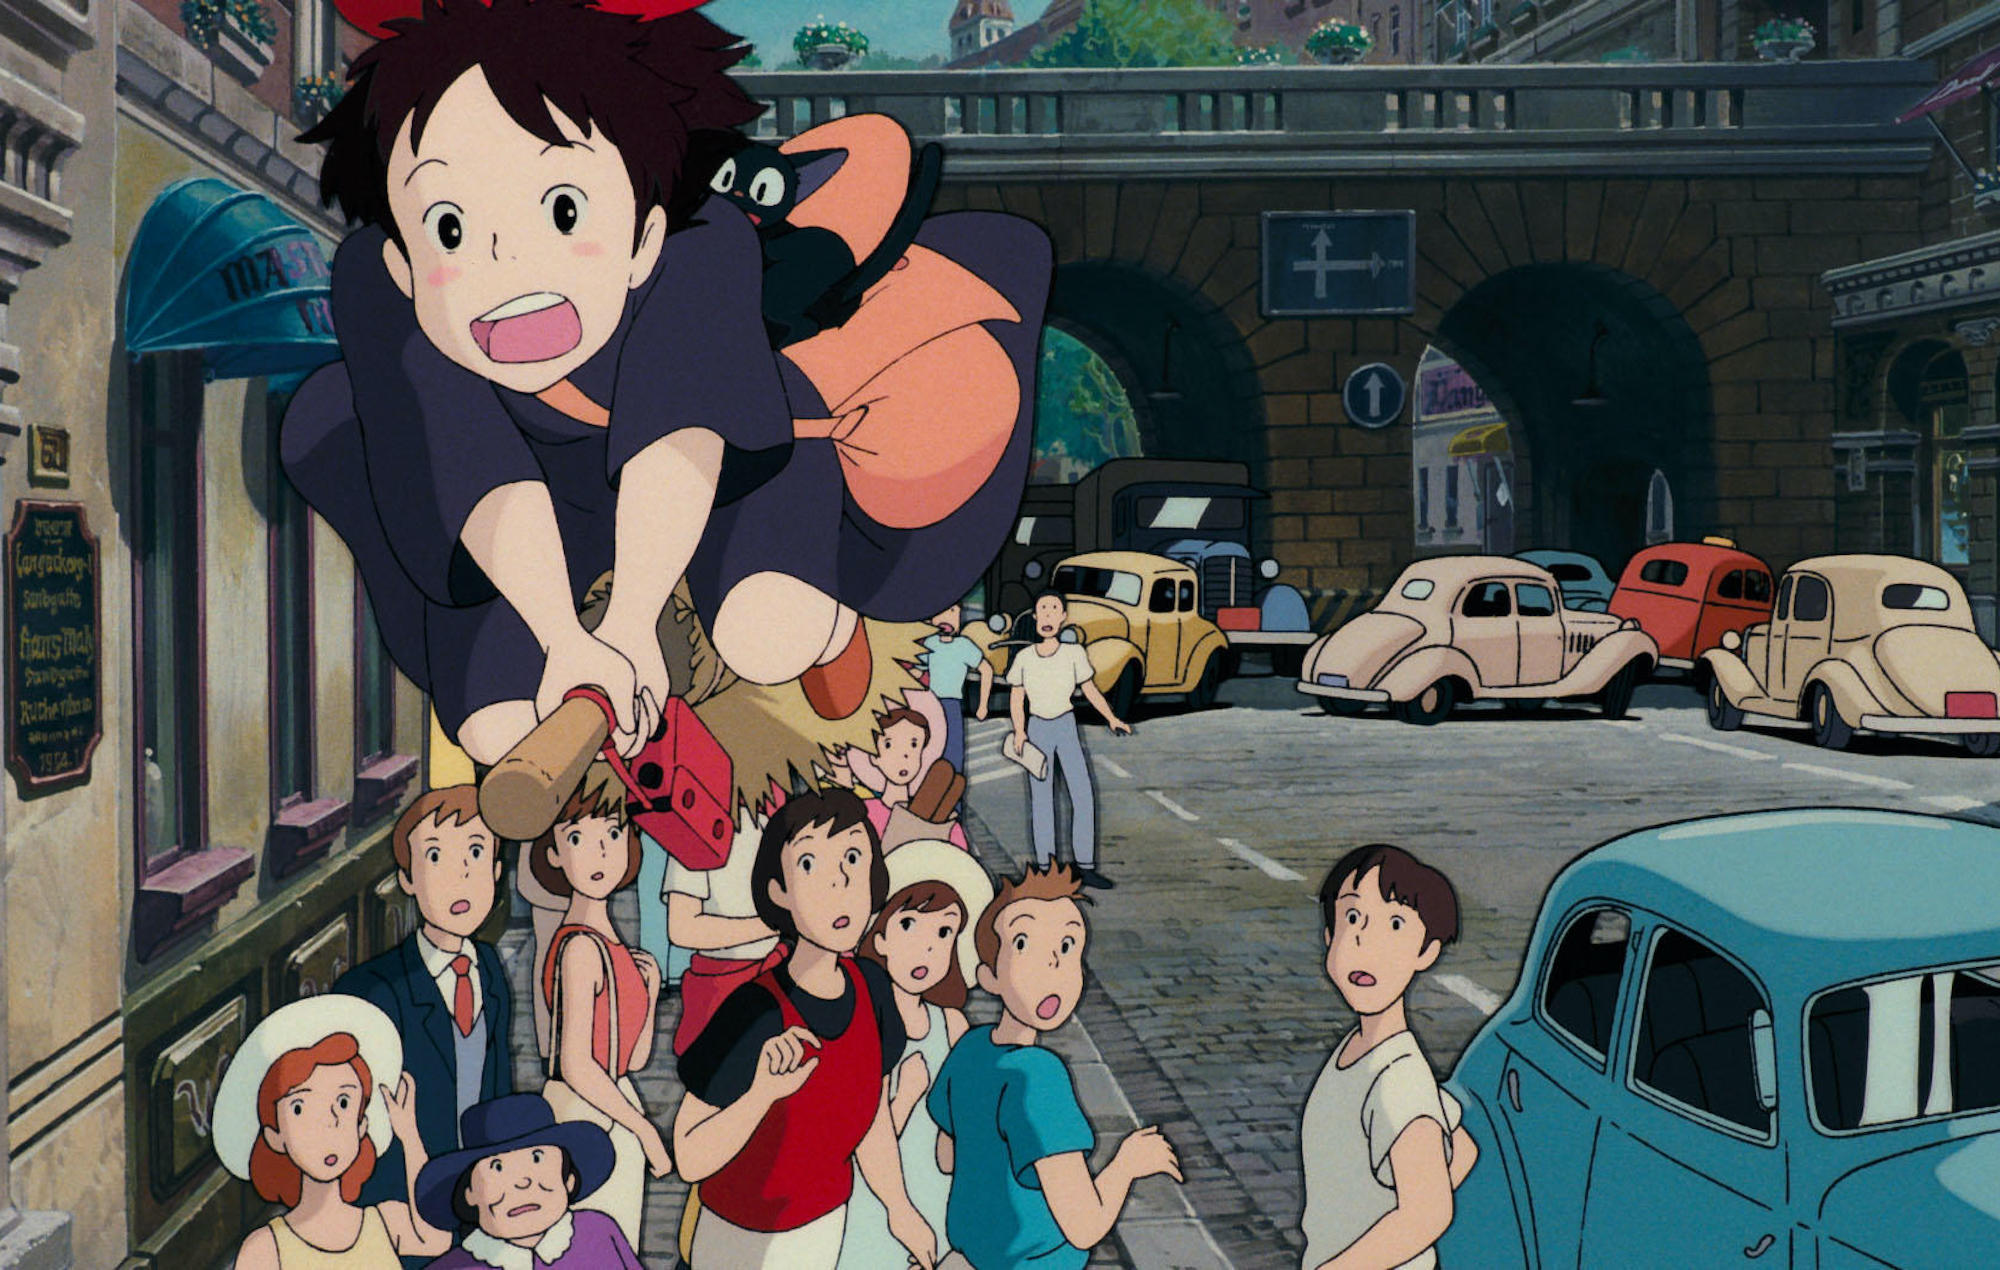 Kiki's Delivery Service, Studio Ghibli